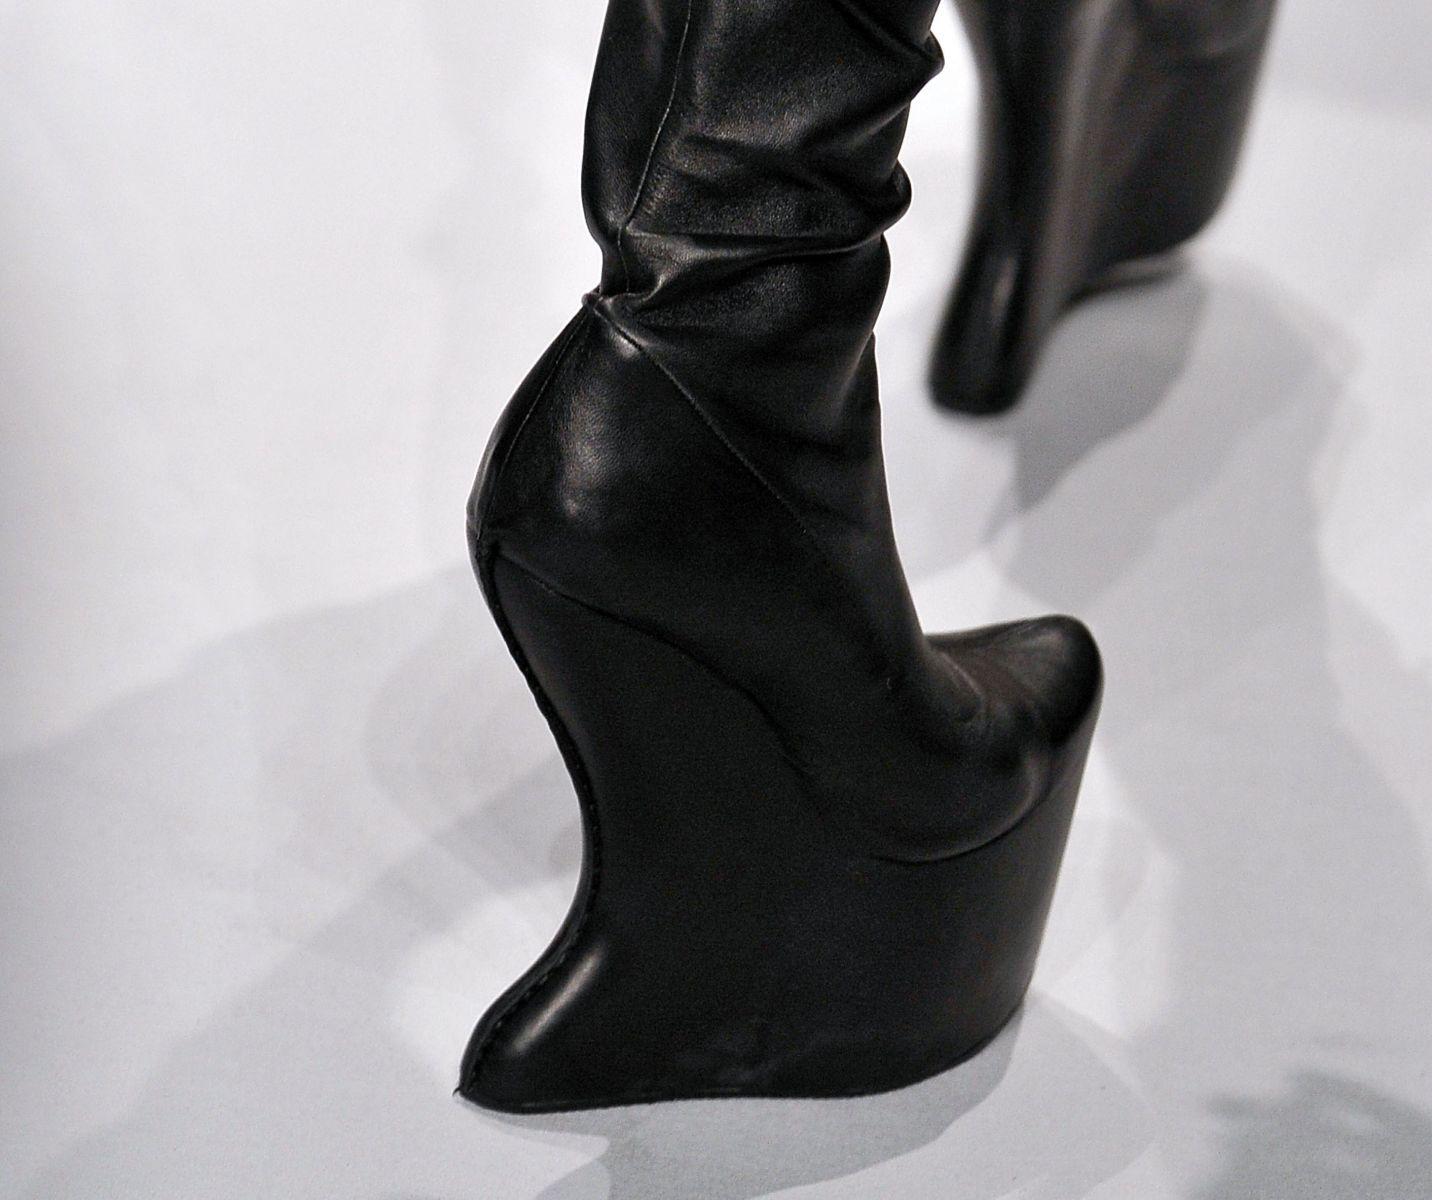 обувь 2013 платформа